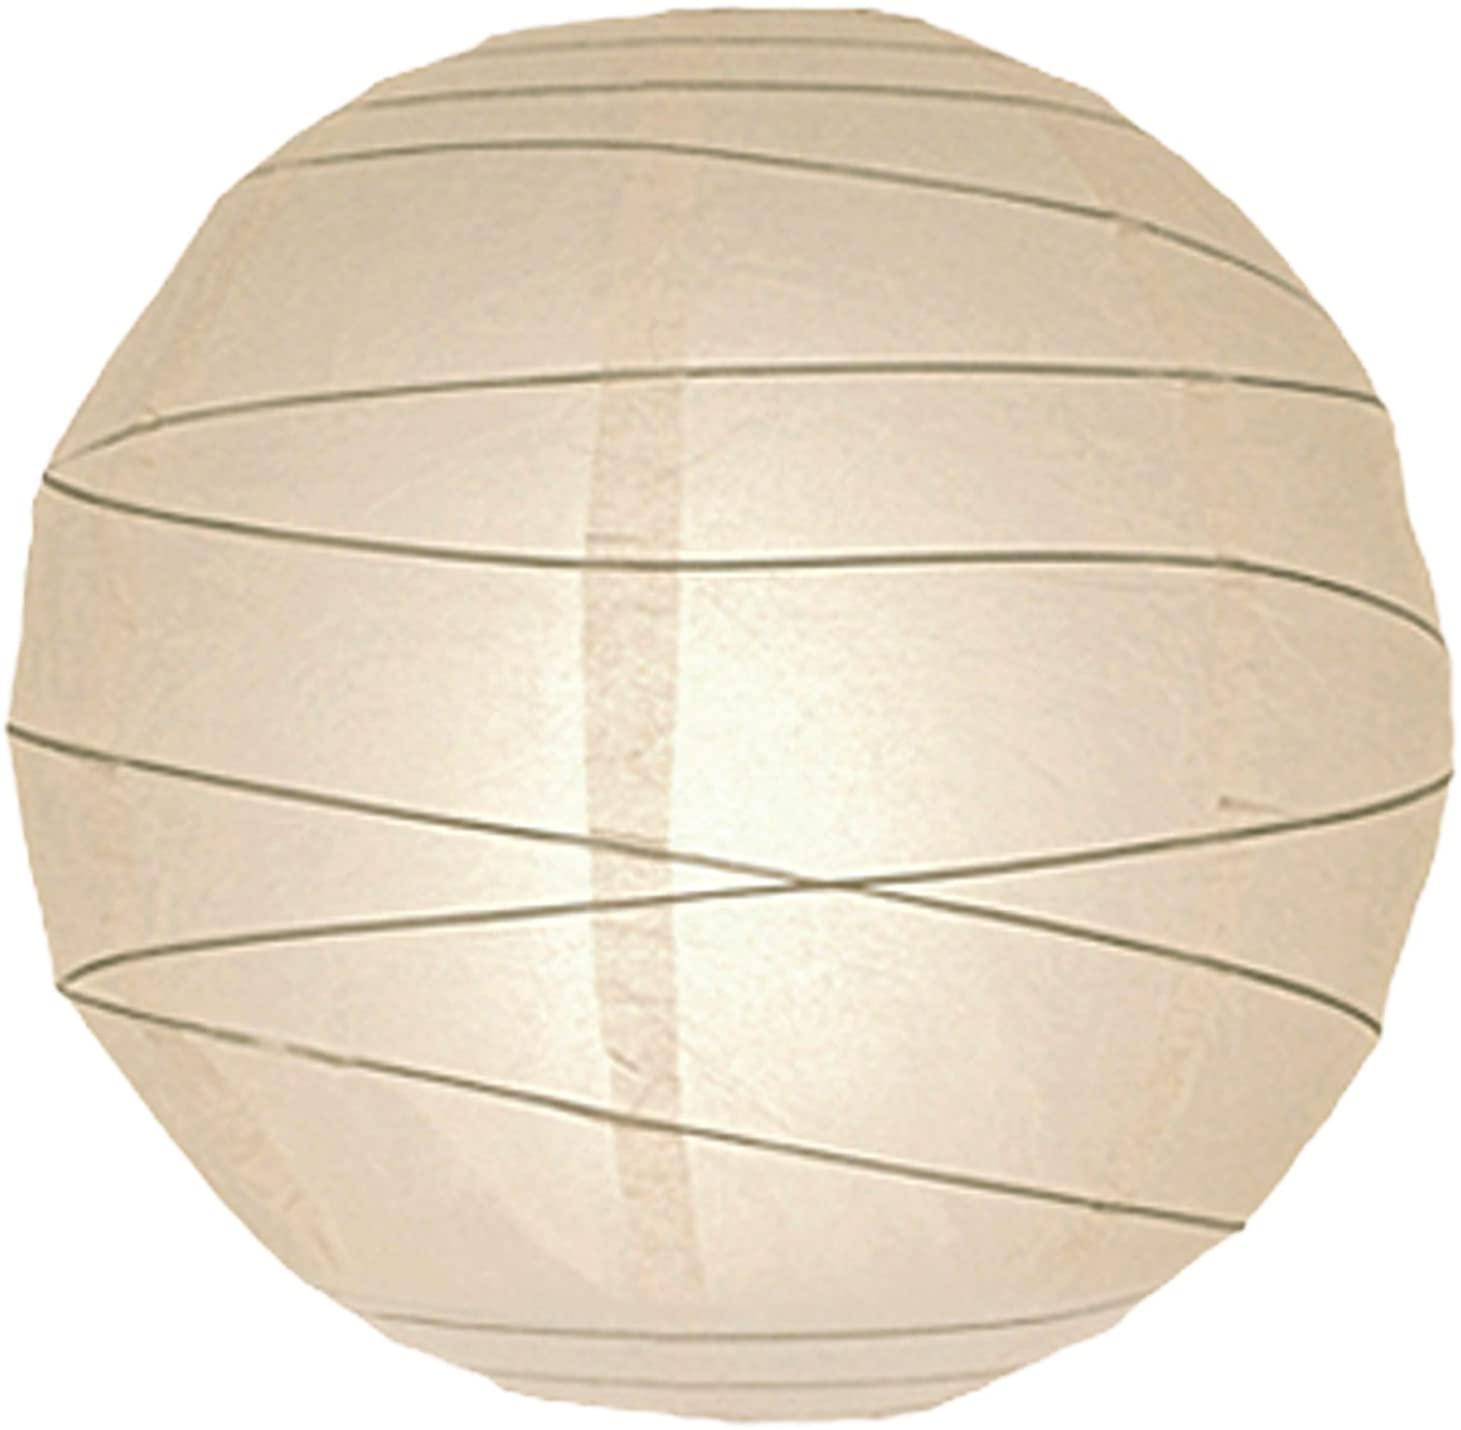 Lighting Web 16-inch Irregular Paper Lantern, Ivory